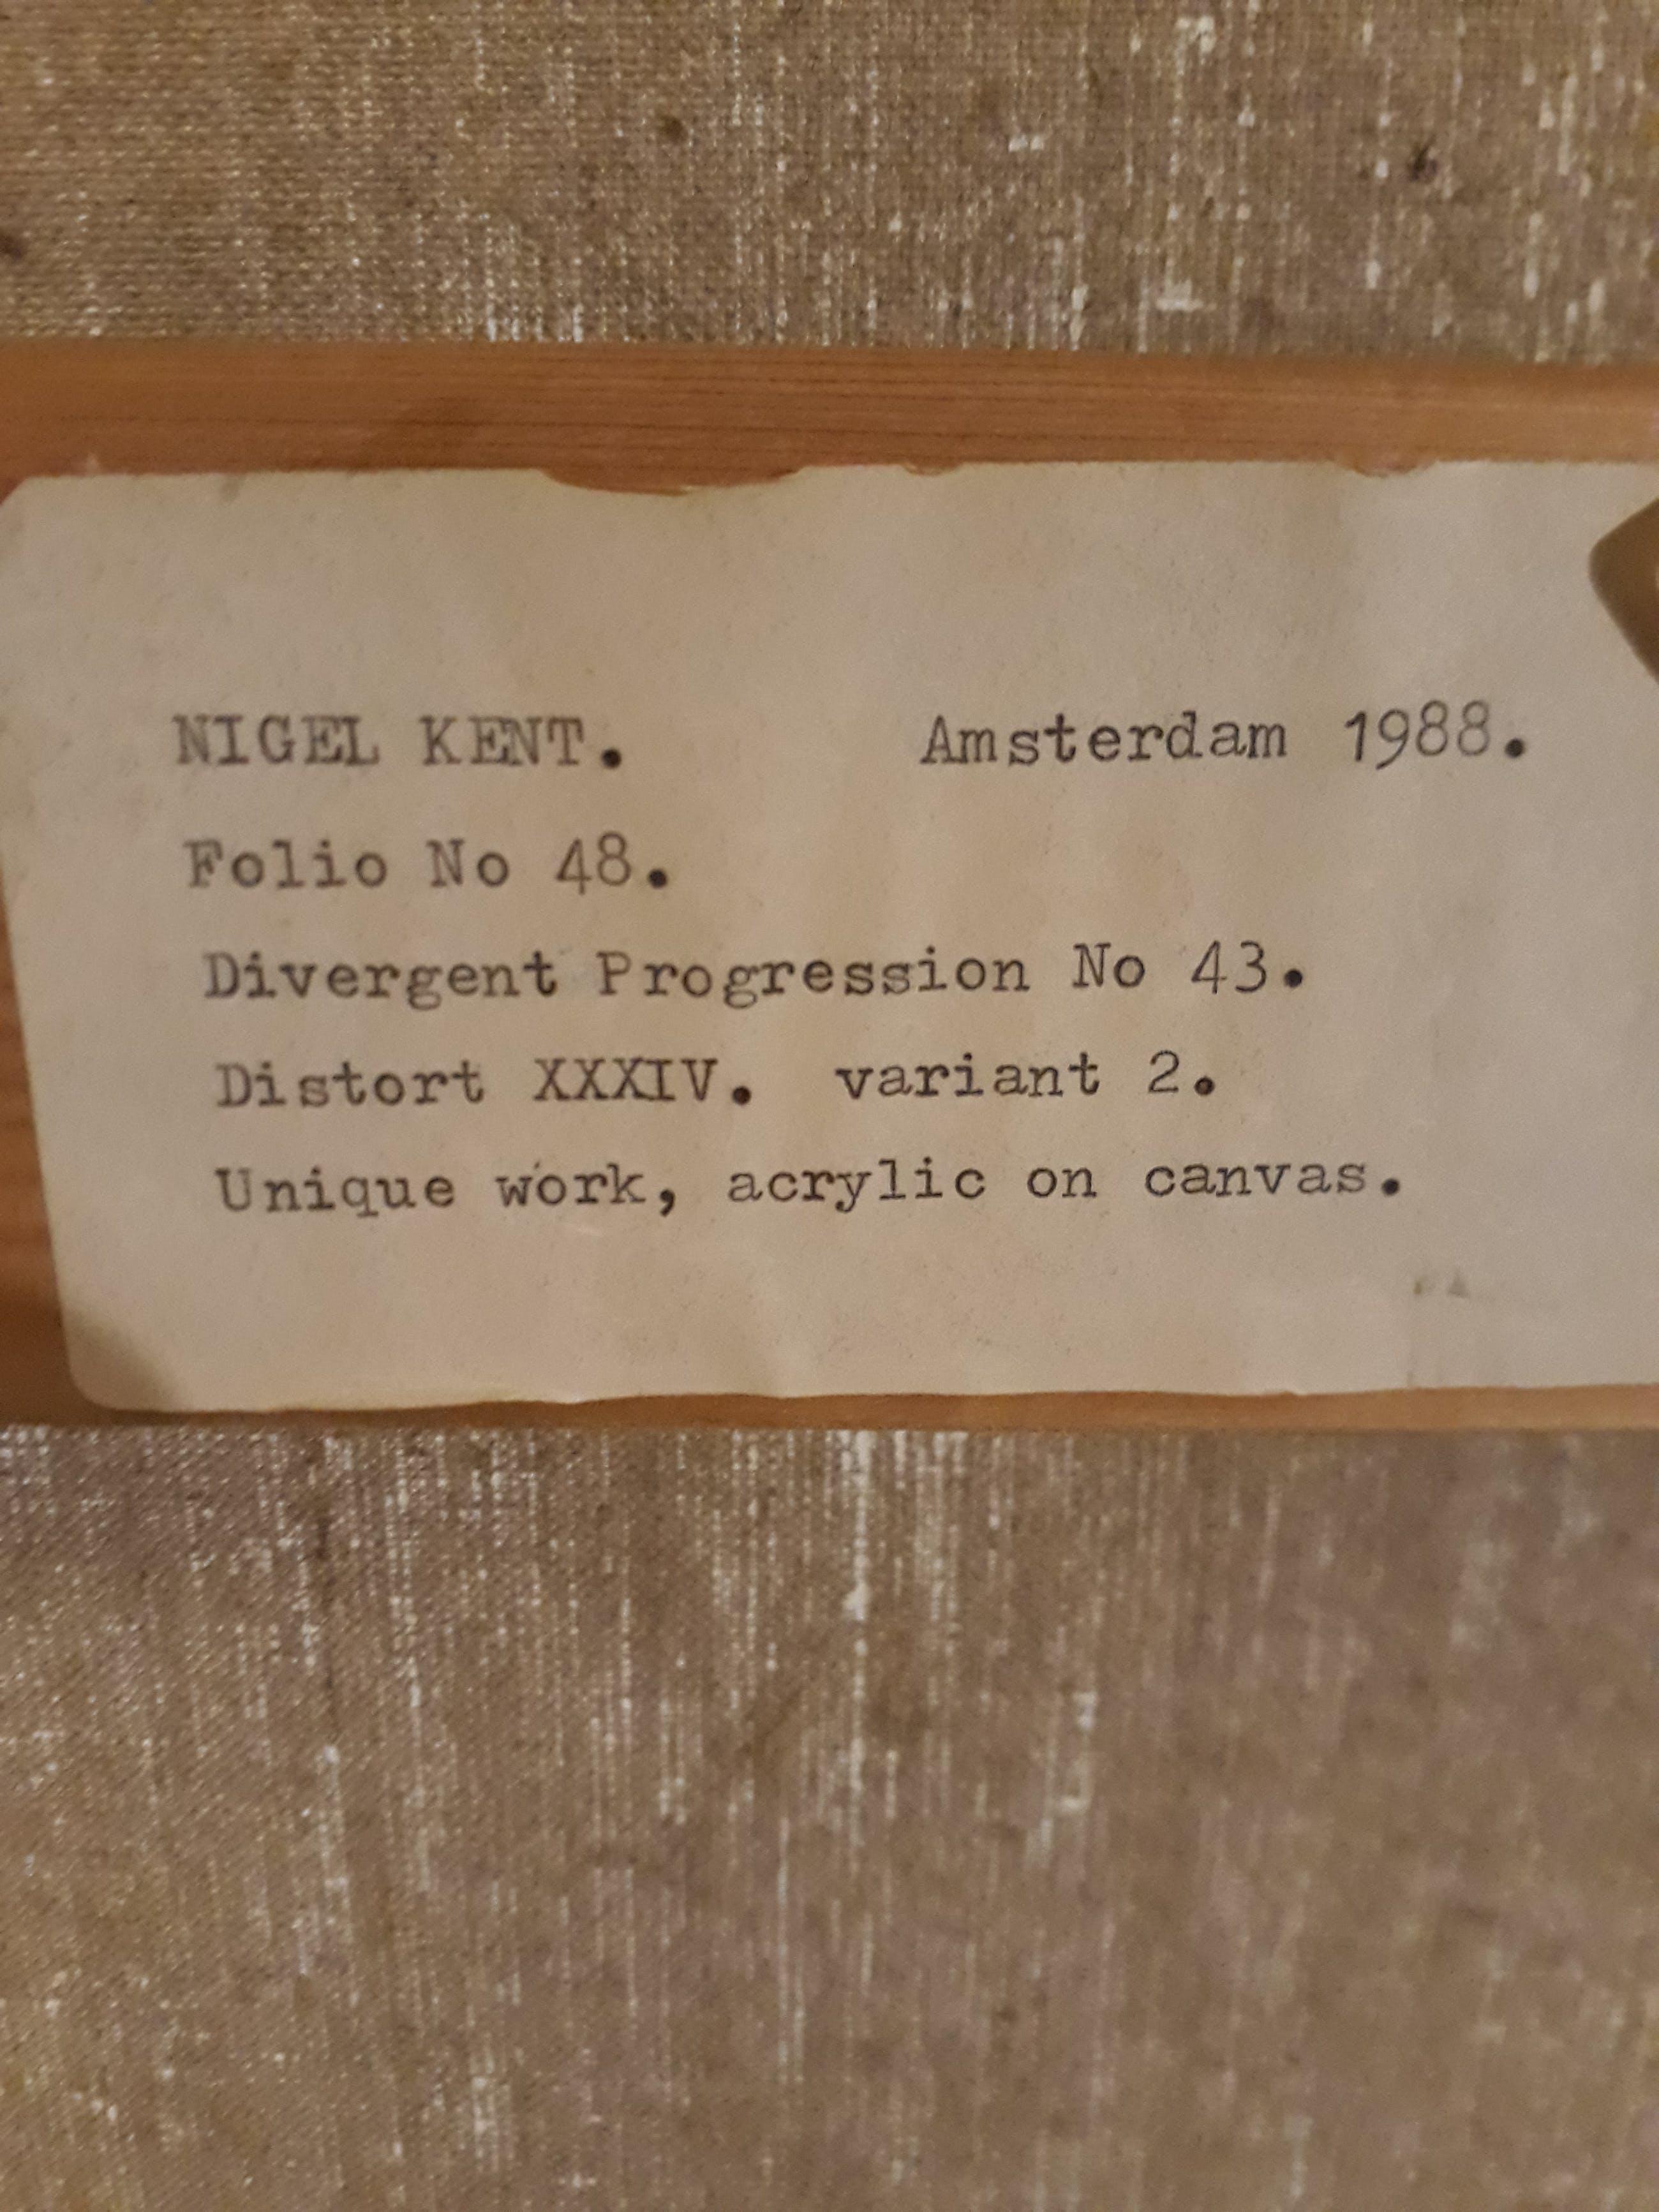 Nigel Kent - Divergent Progression Distert folio no 48 kopen? Bied vanaf 80!